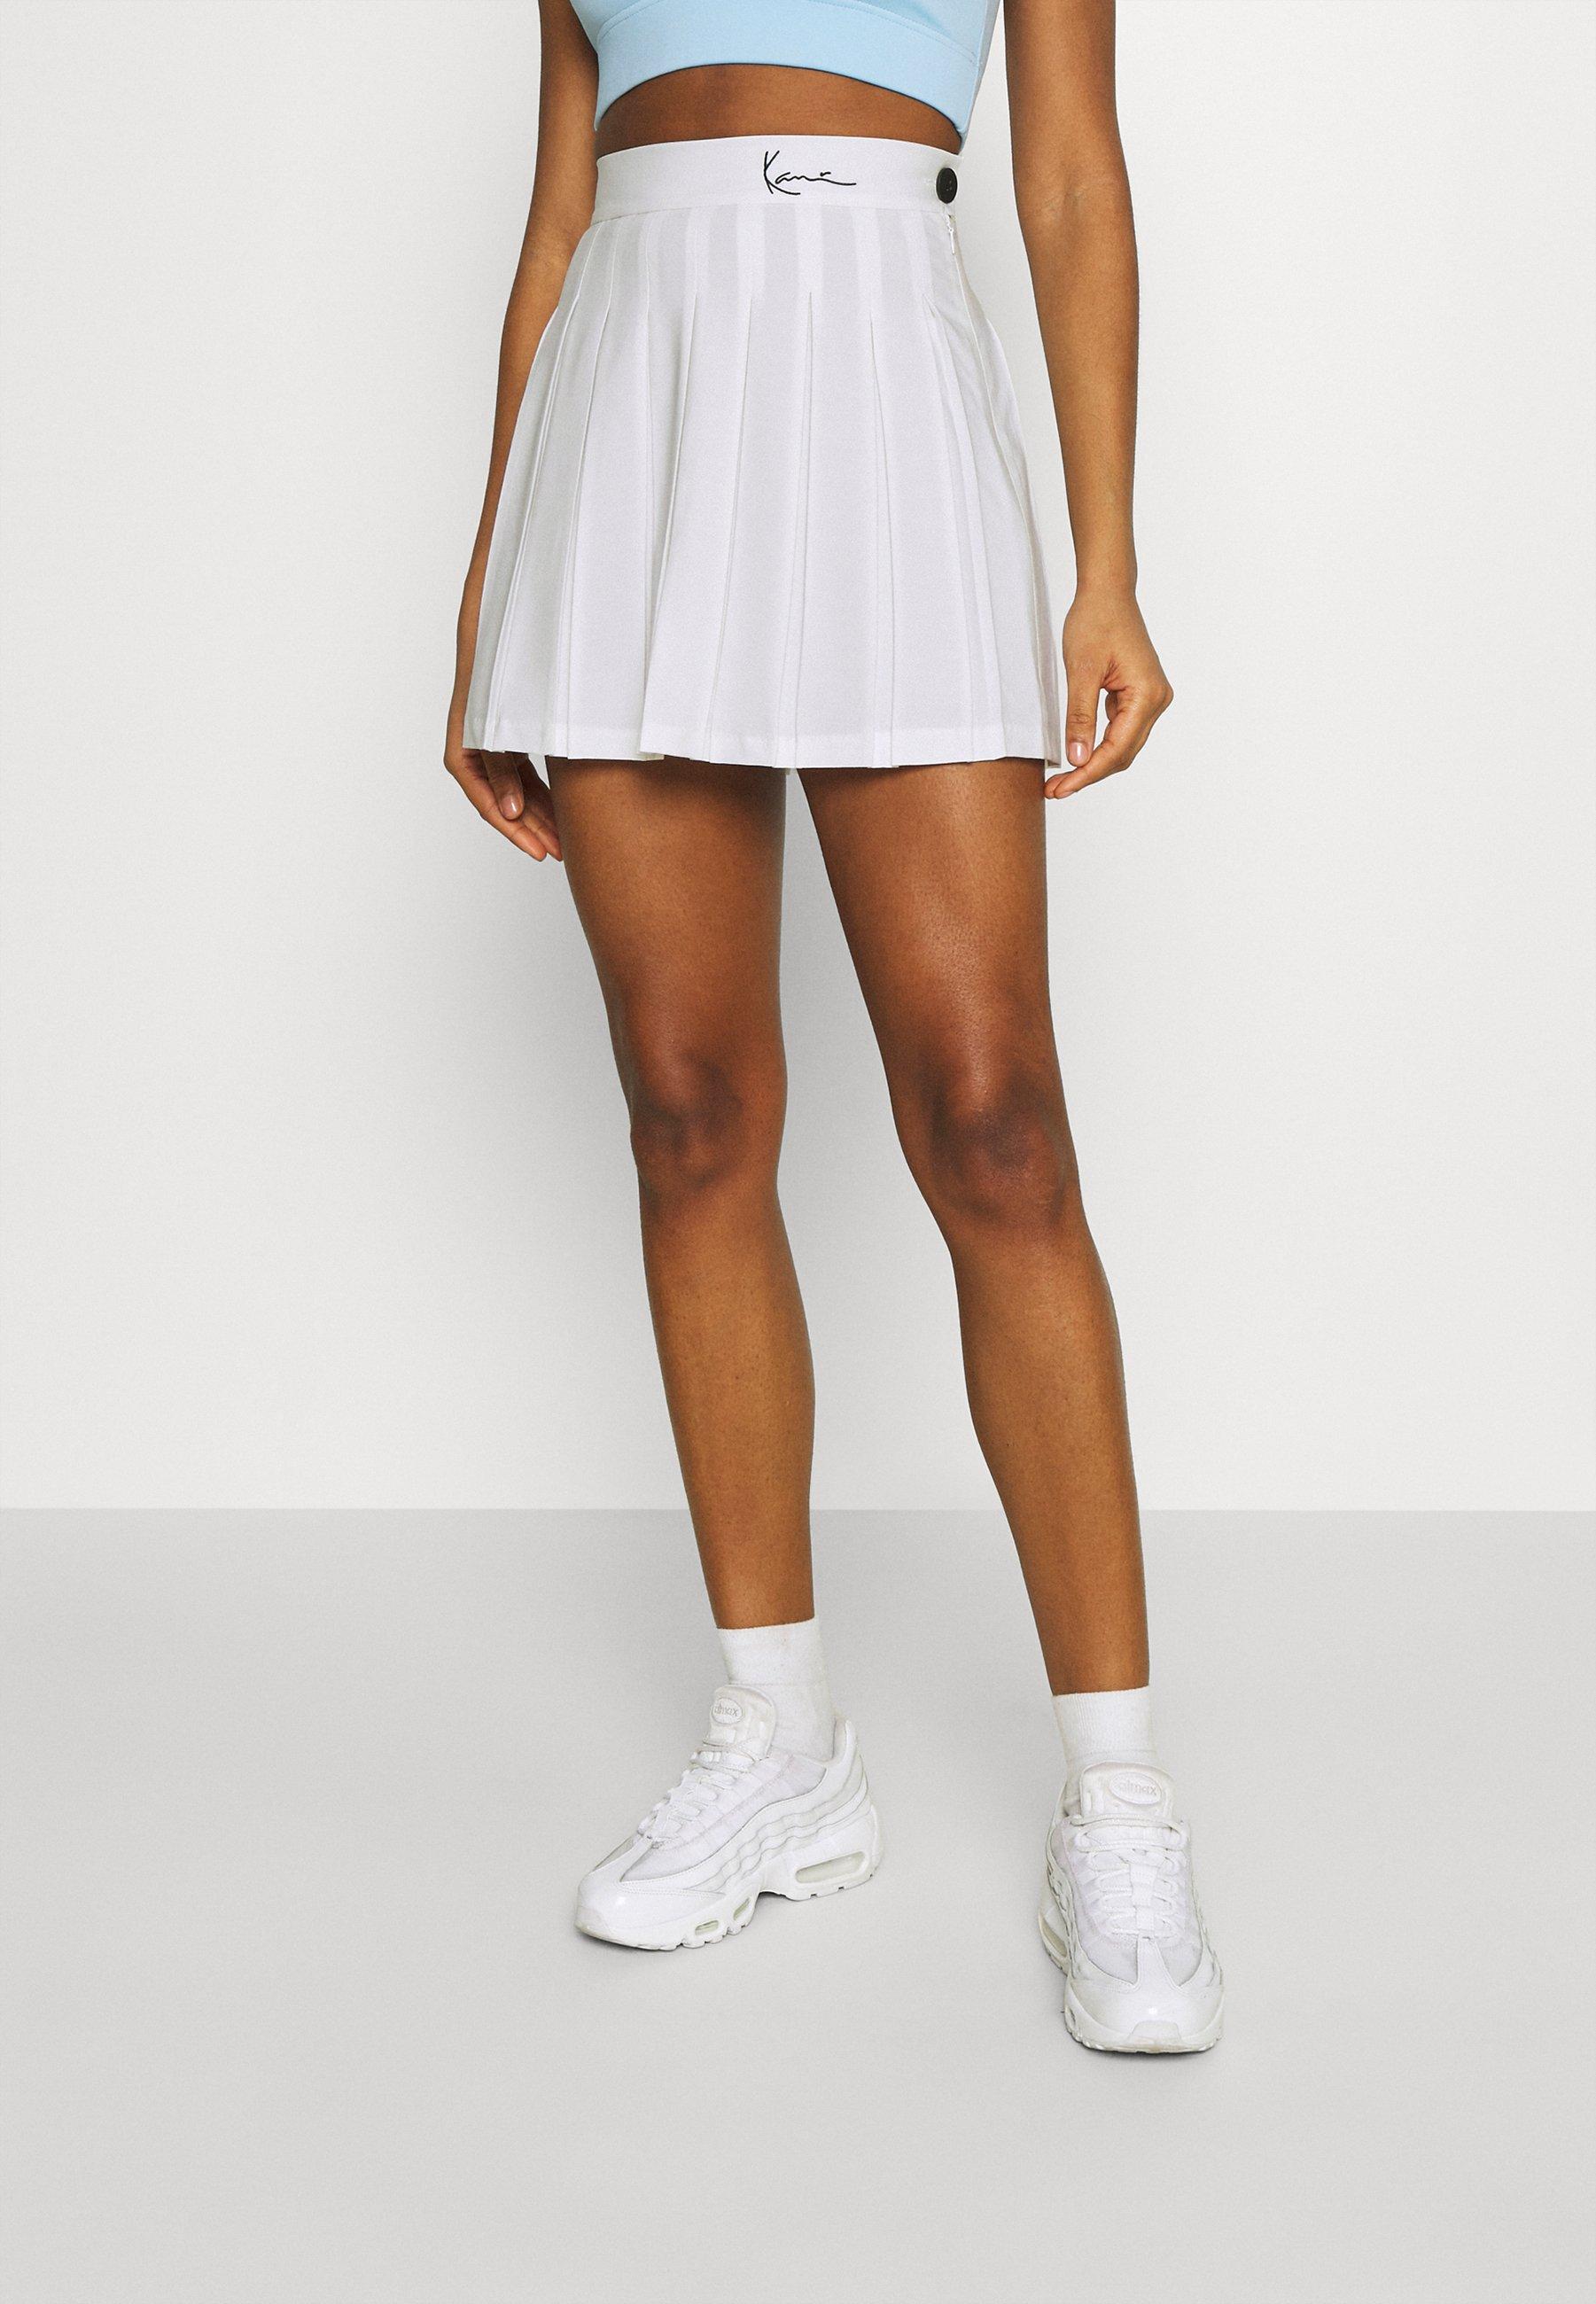 Femme SMALL SIGNATURE TENNIS SKIRT - Minijupe